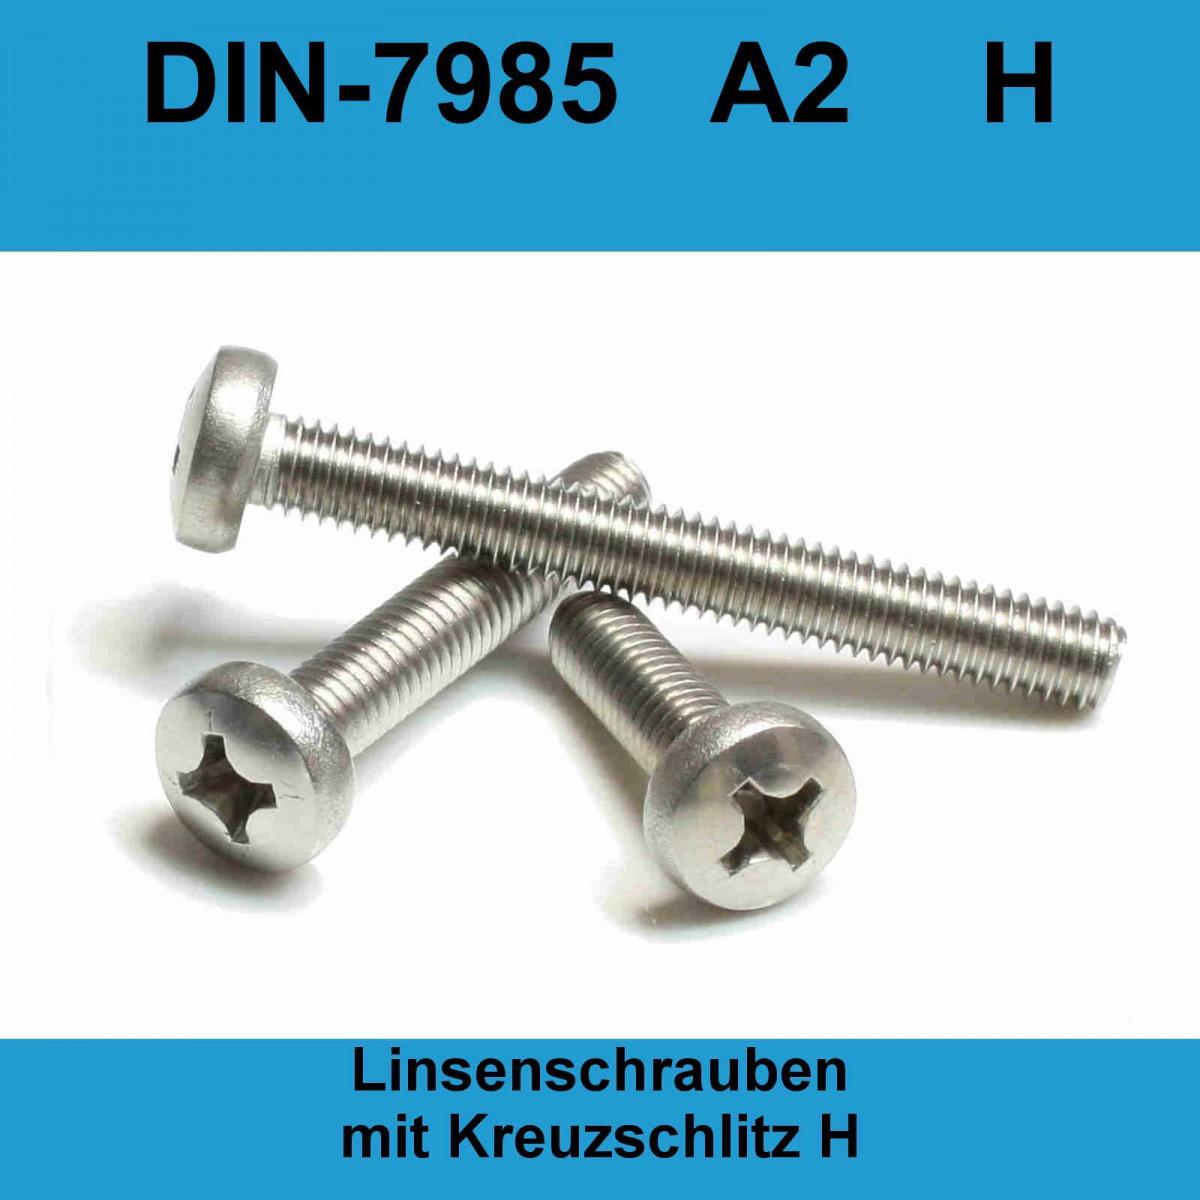 25 Stück Linsenkopf Kreuz DIN 7985 M3x50  EDELSTAHL A2 M3 x 50